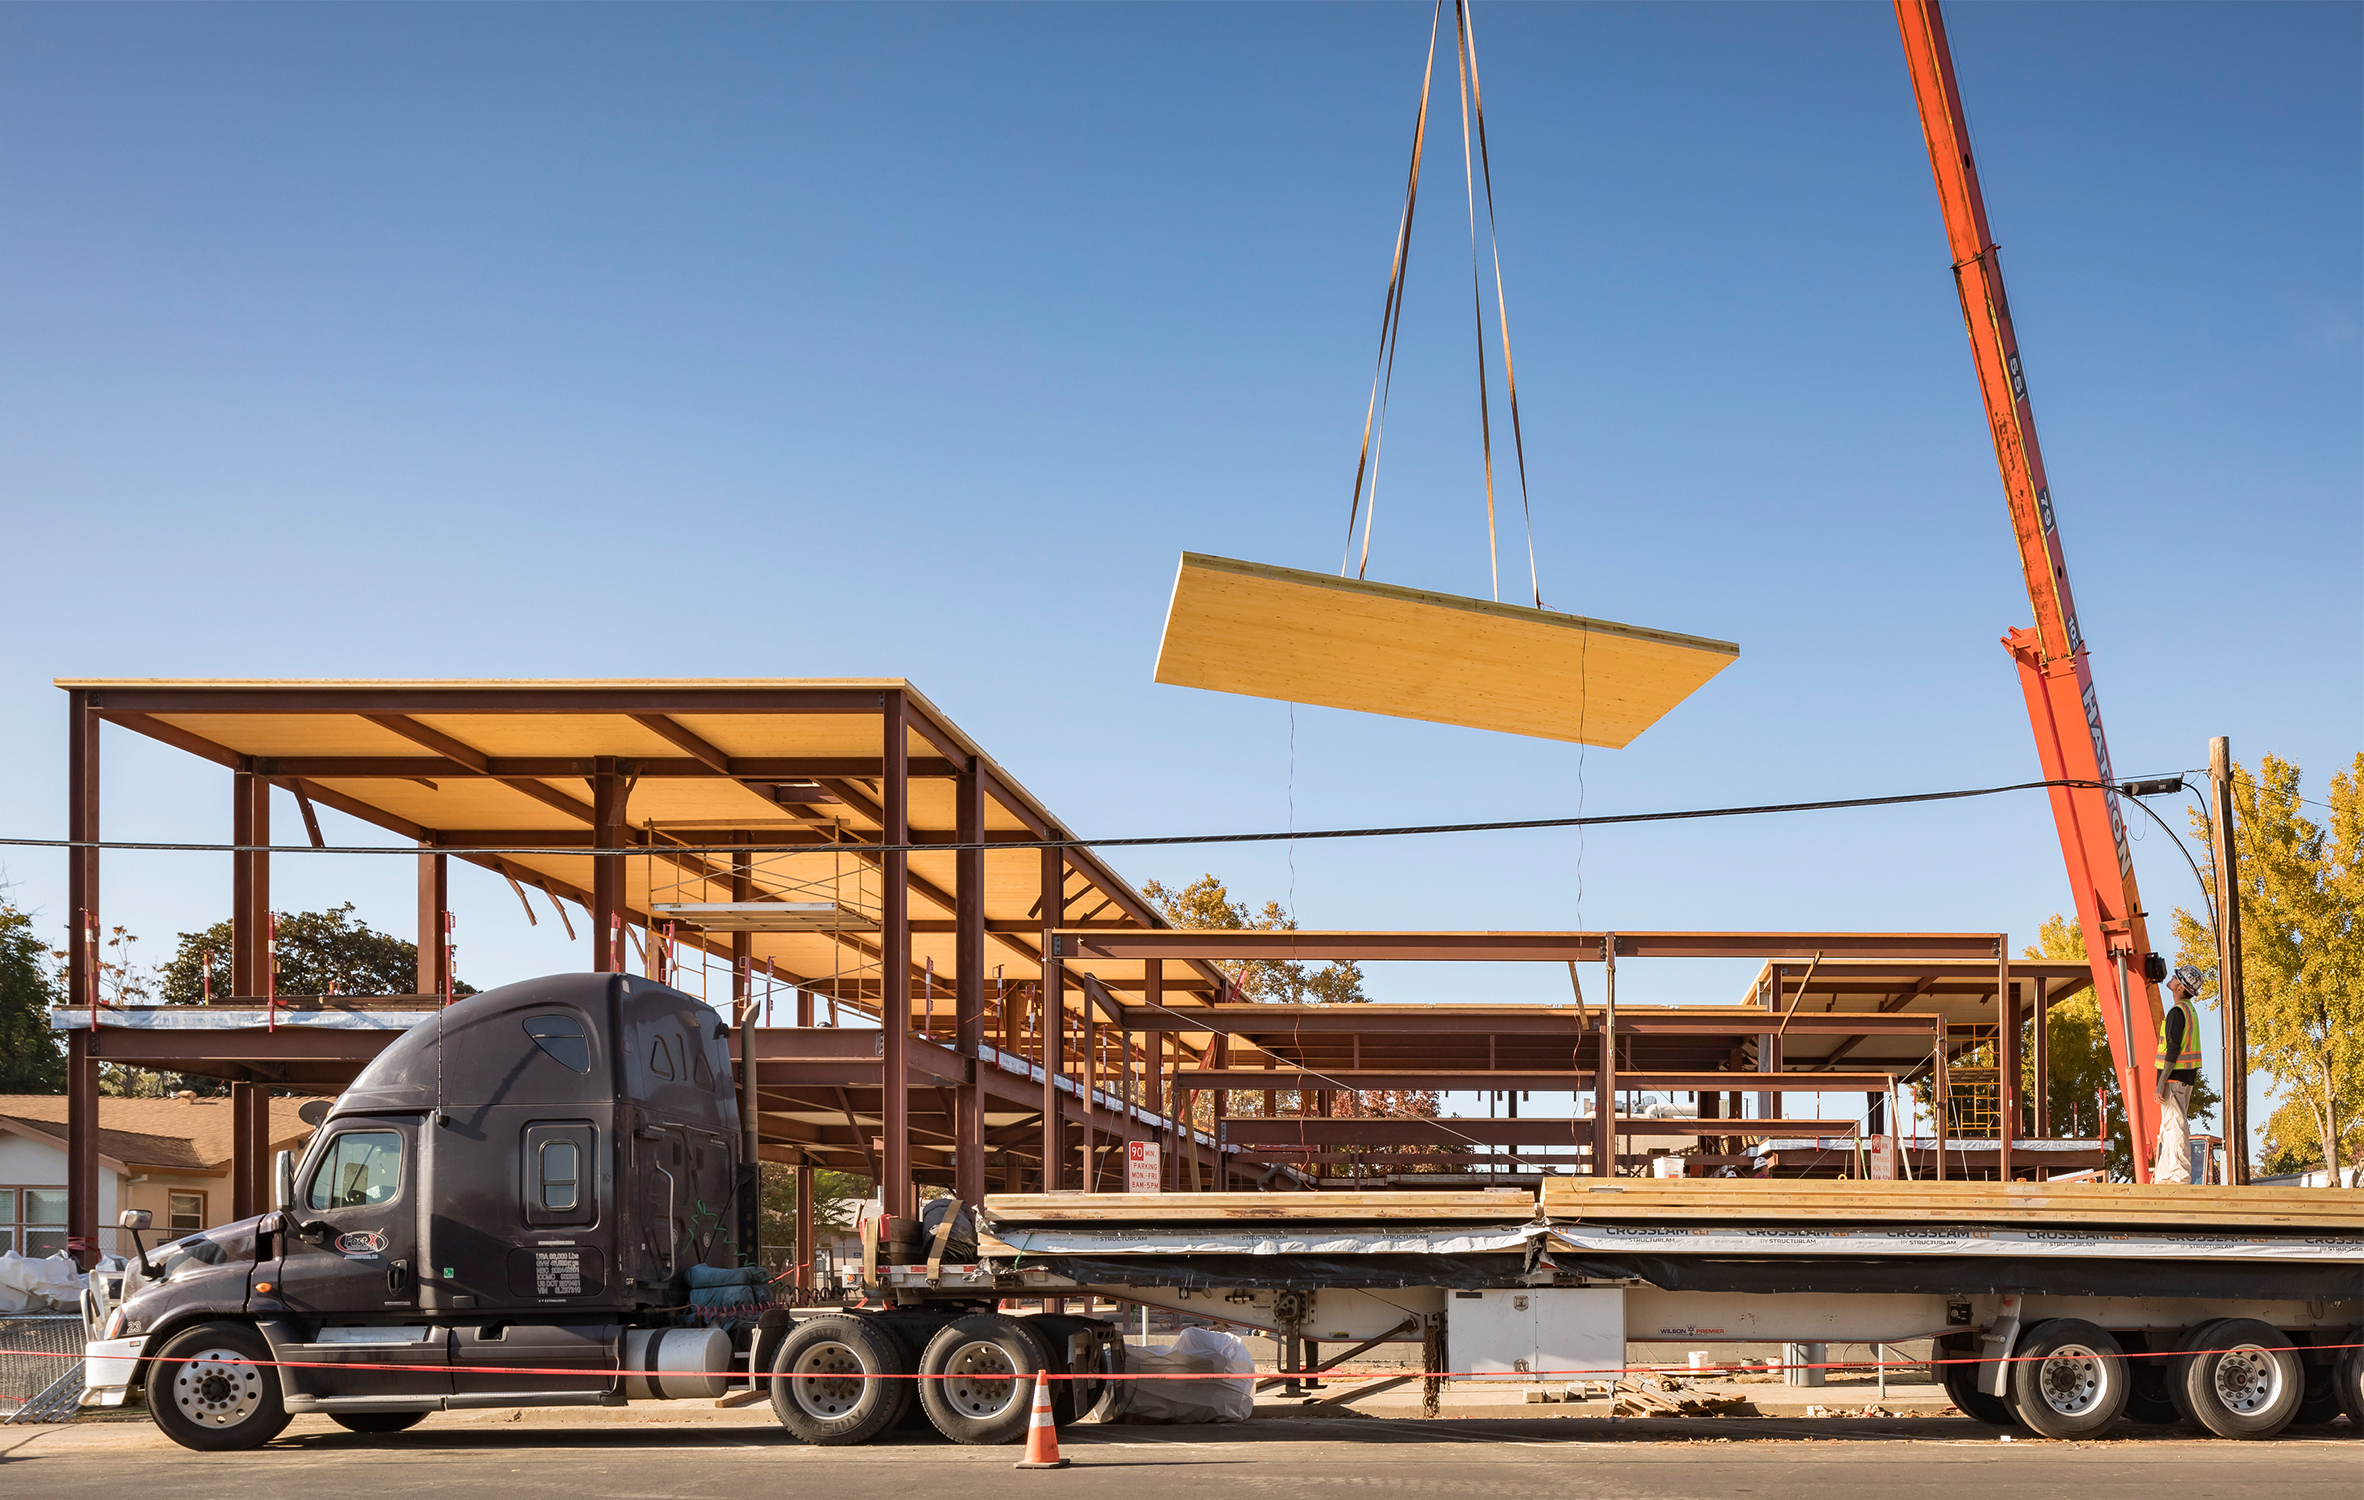 Brentwood Public Library truck unloads CLT panels